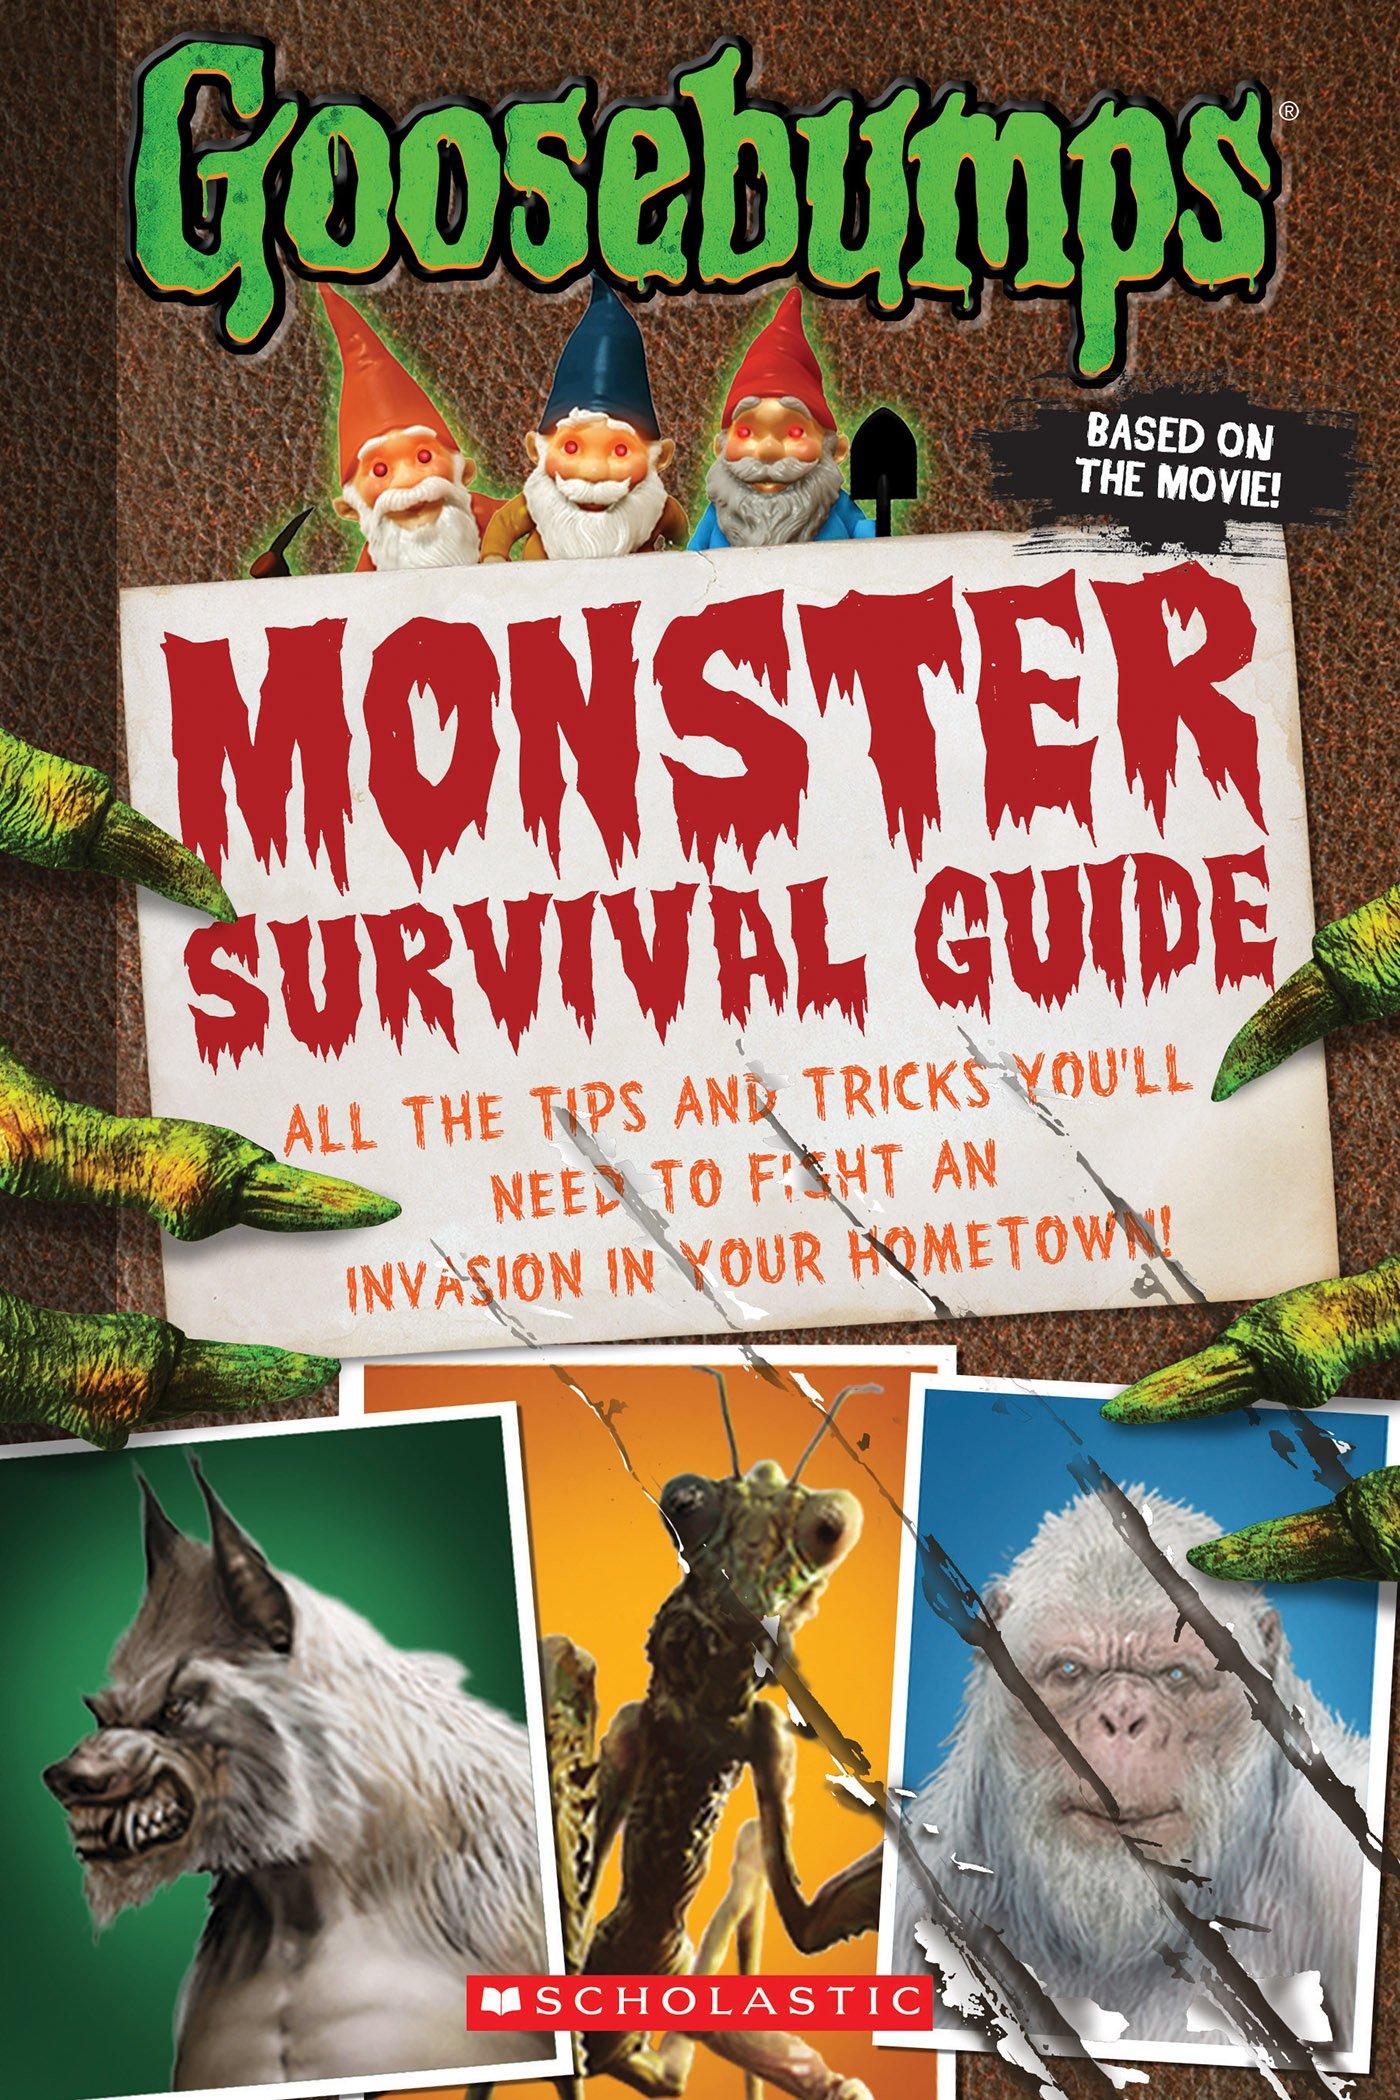 Monster survival guide goosebumps wiki fandom powered by wikia goosebumps monster survival guide solutioingenieria Images